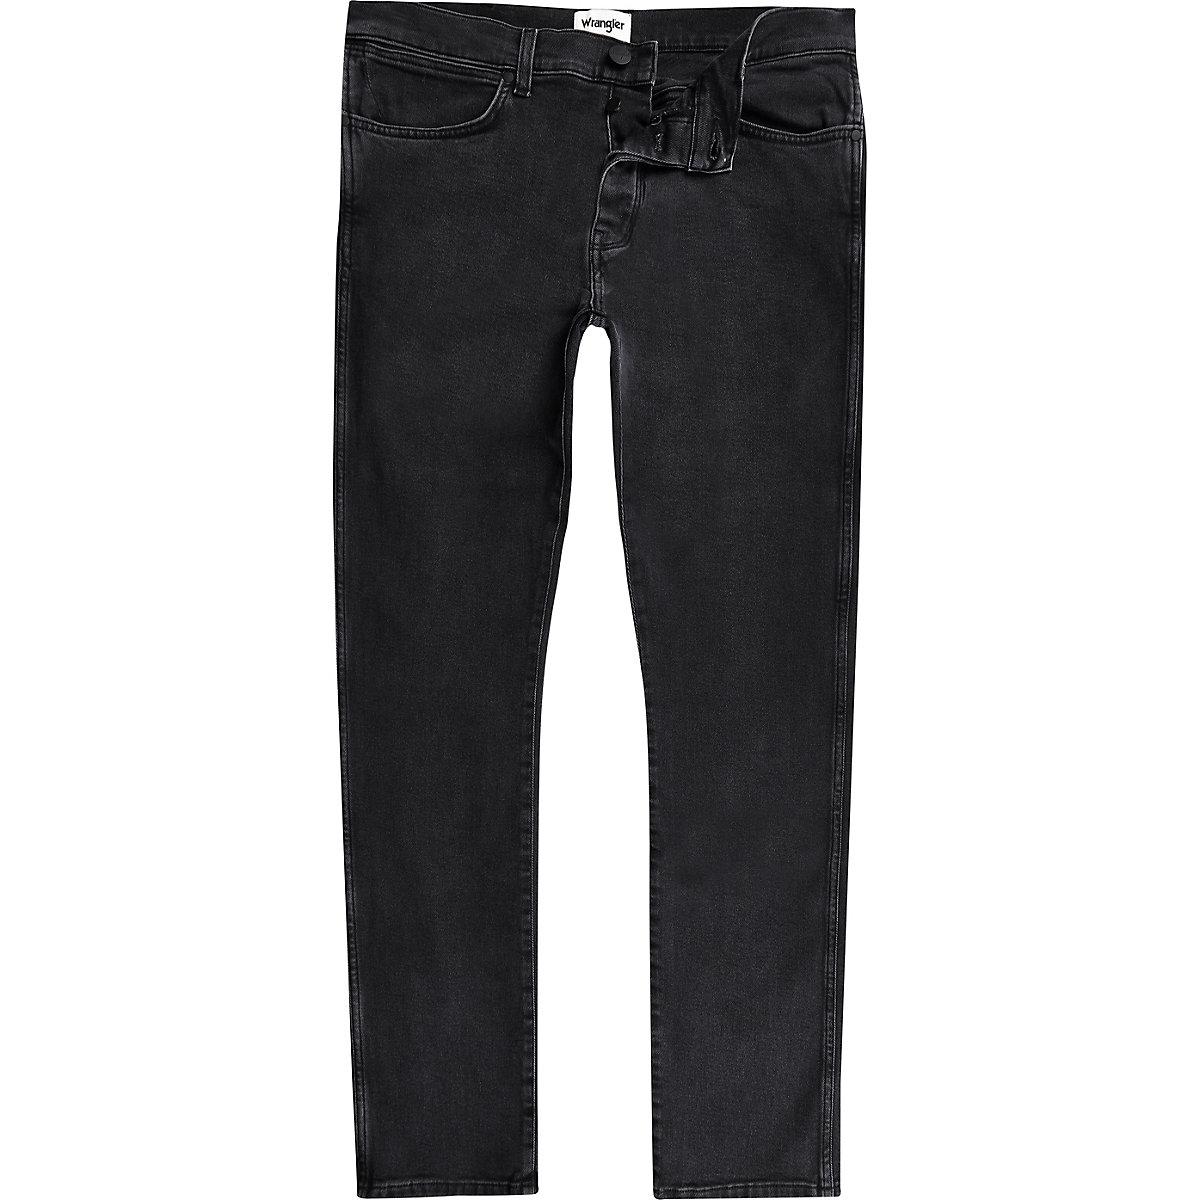 Wrangler black Spencer slim fit jeans